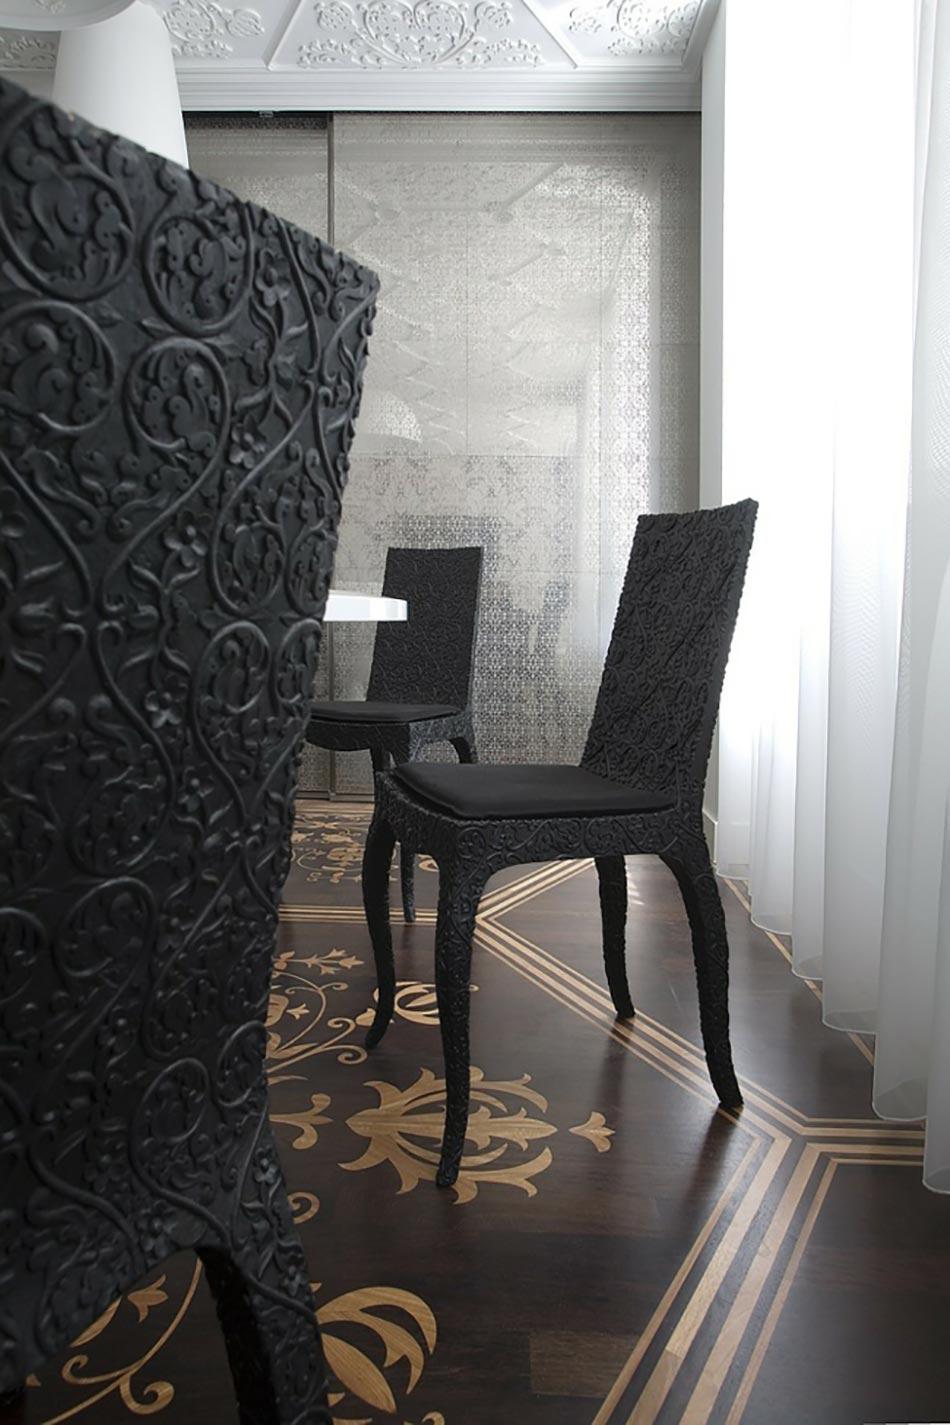 Maison de luxe remodel e par le designer marcel wanders - Residence de haut standing amsterdam marcel wanders ...